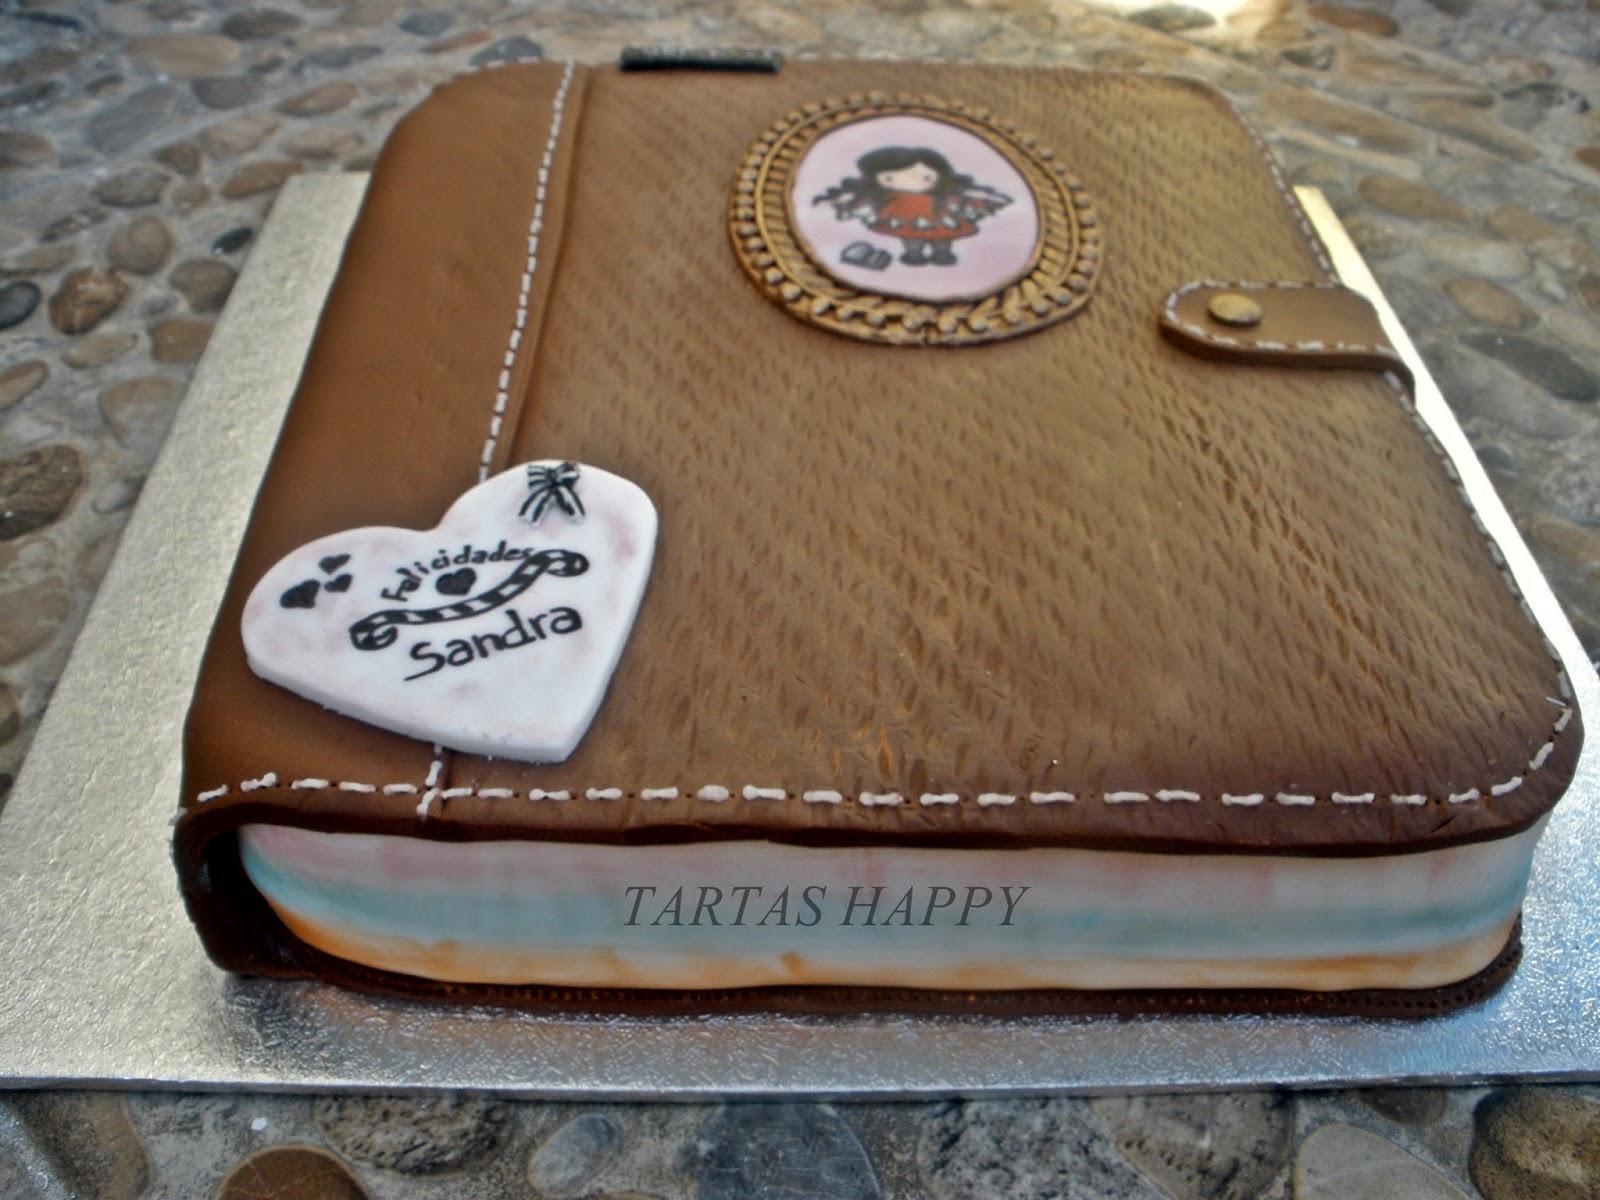 Tartas happy tarta agenda mu eca gorjuss regalo para mi for Regalos para hermanas